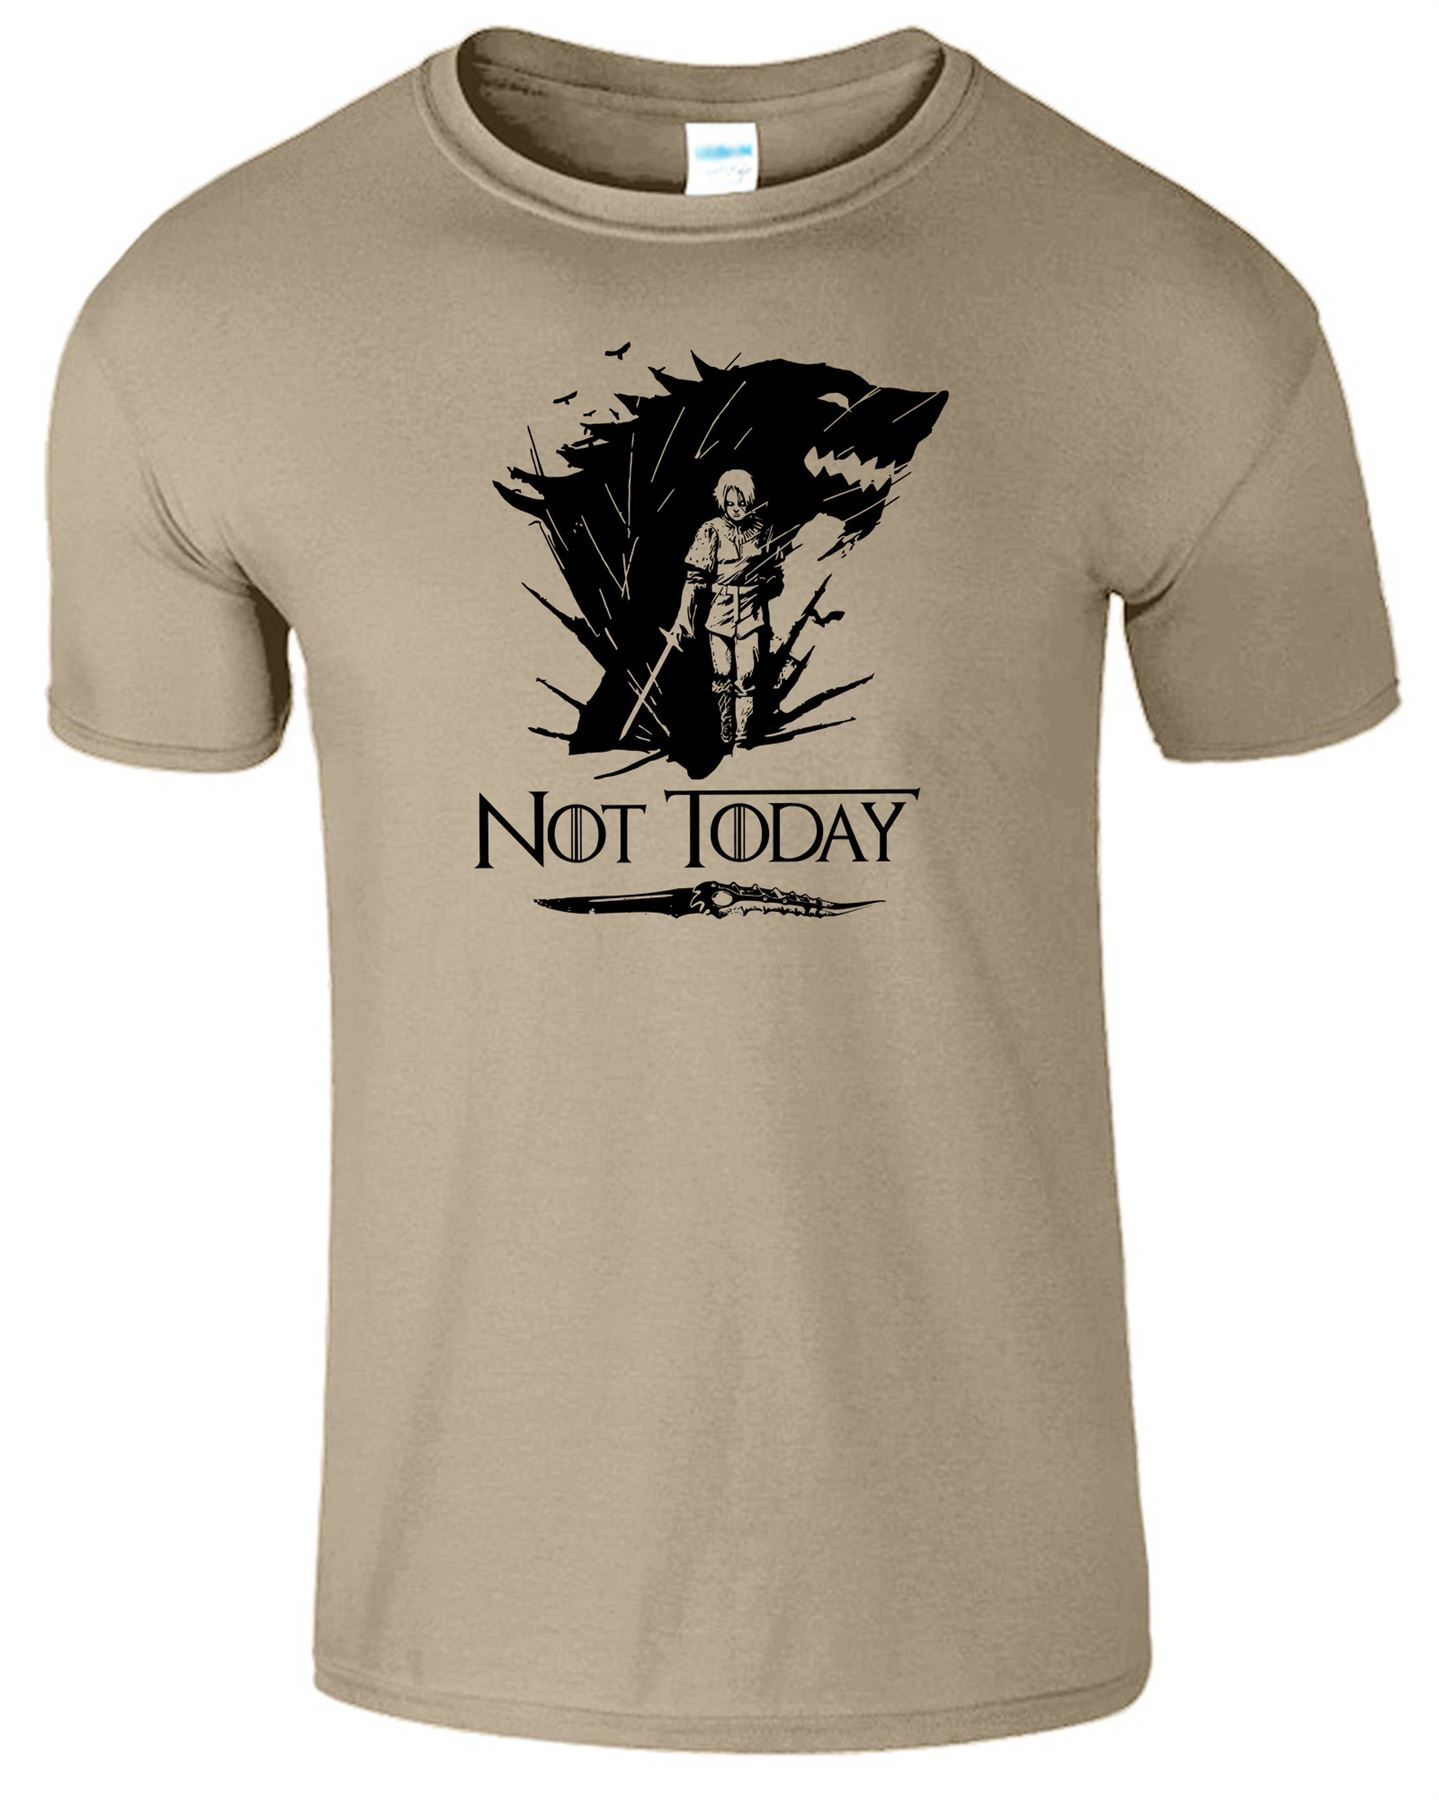 Arya-Stark-Not-Today-T-Shirt-Mens-Game-Season-Womens-Shirt-Adults-Unisex-Fit Indexbild 42